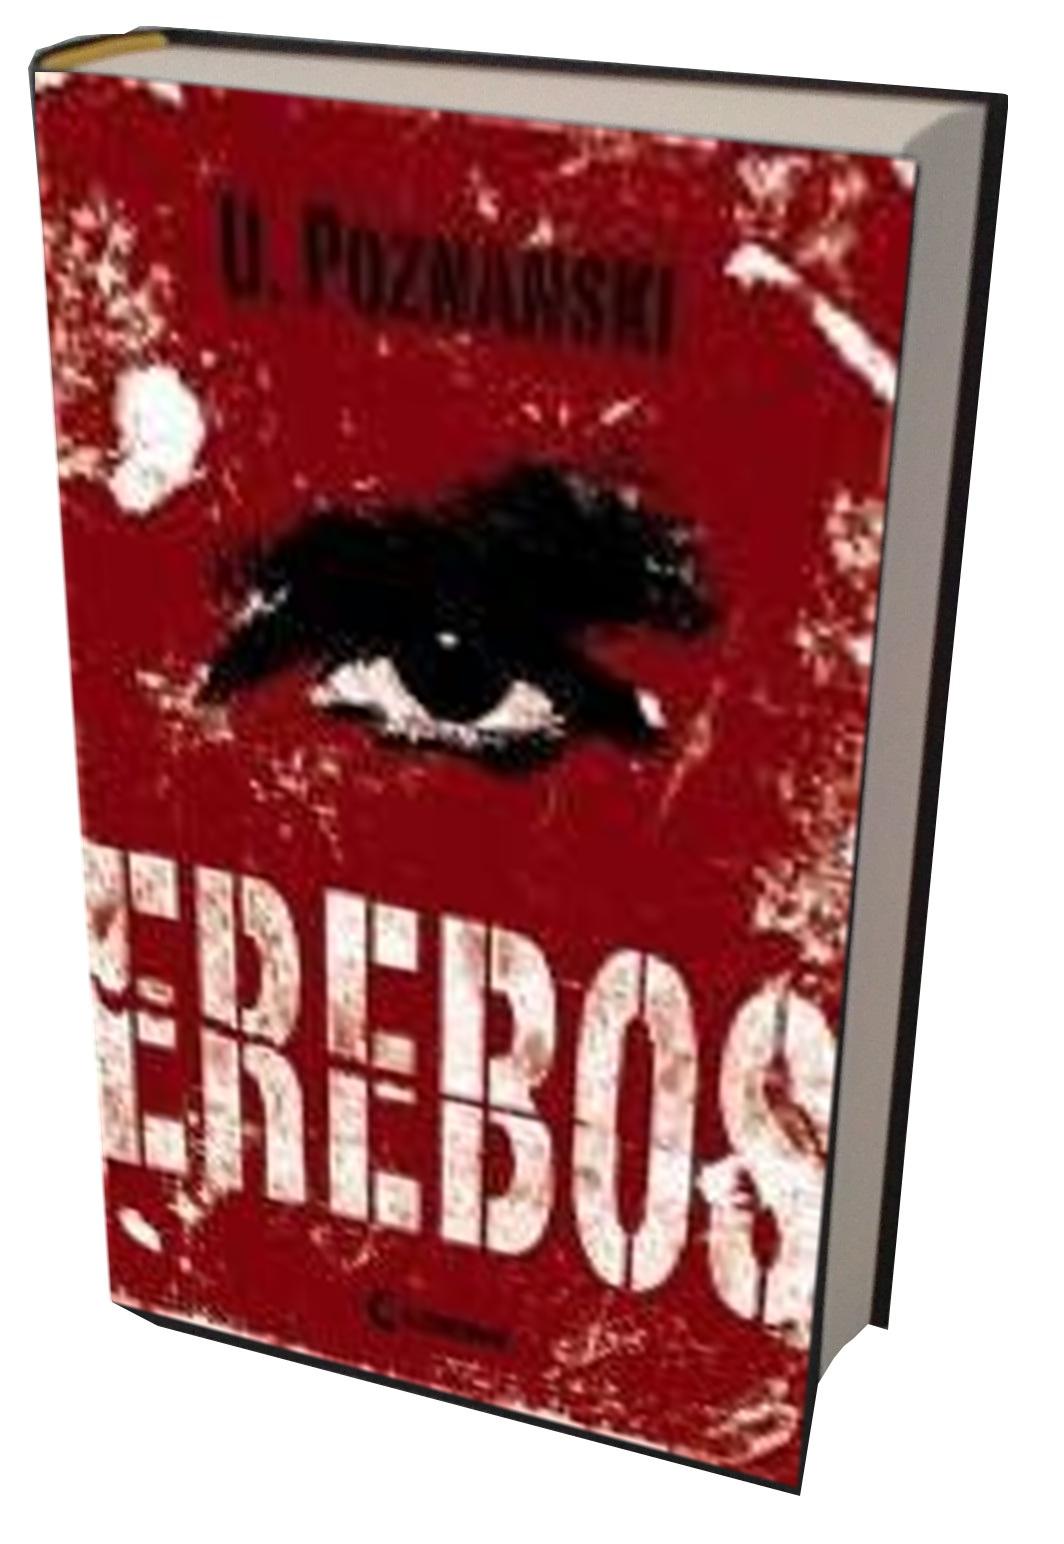 [PROPUESTA]-Erebos Poznanski_Ursula-Erebos